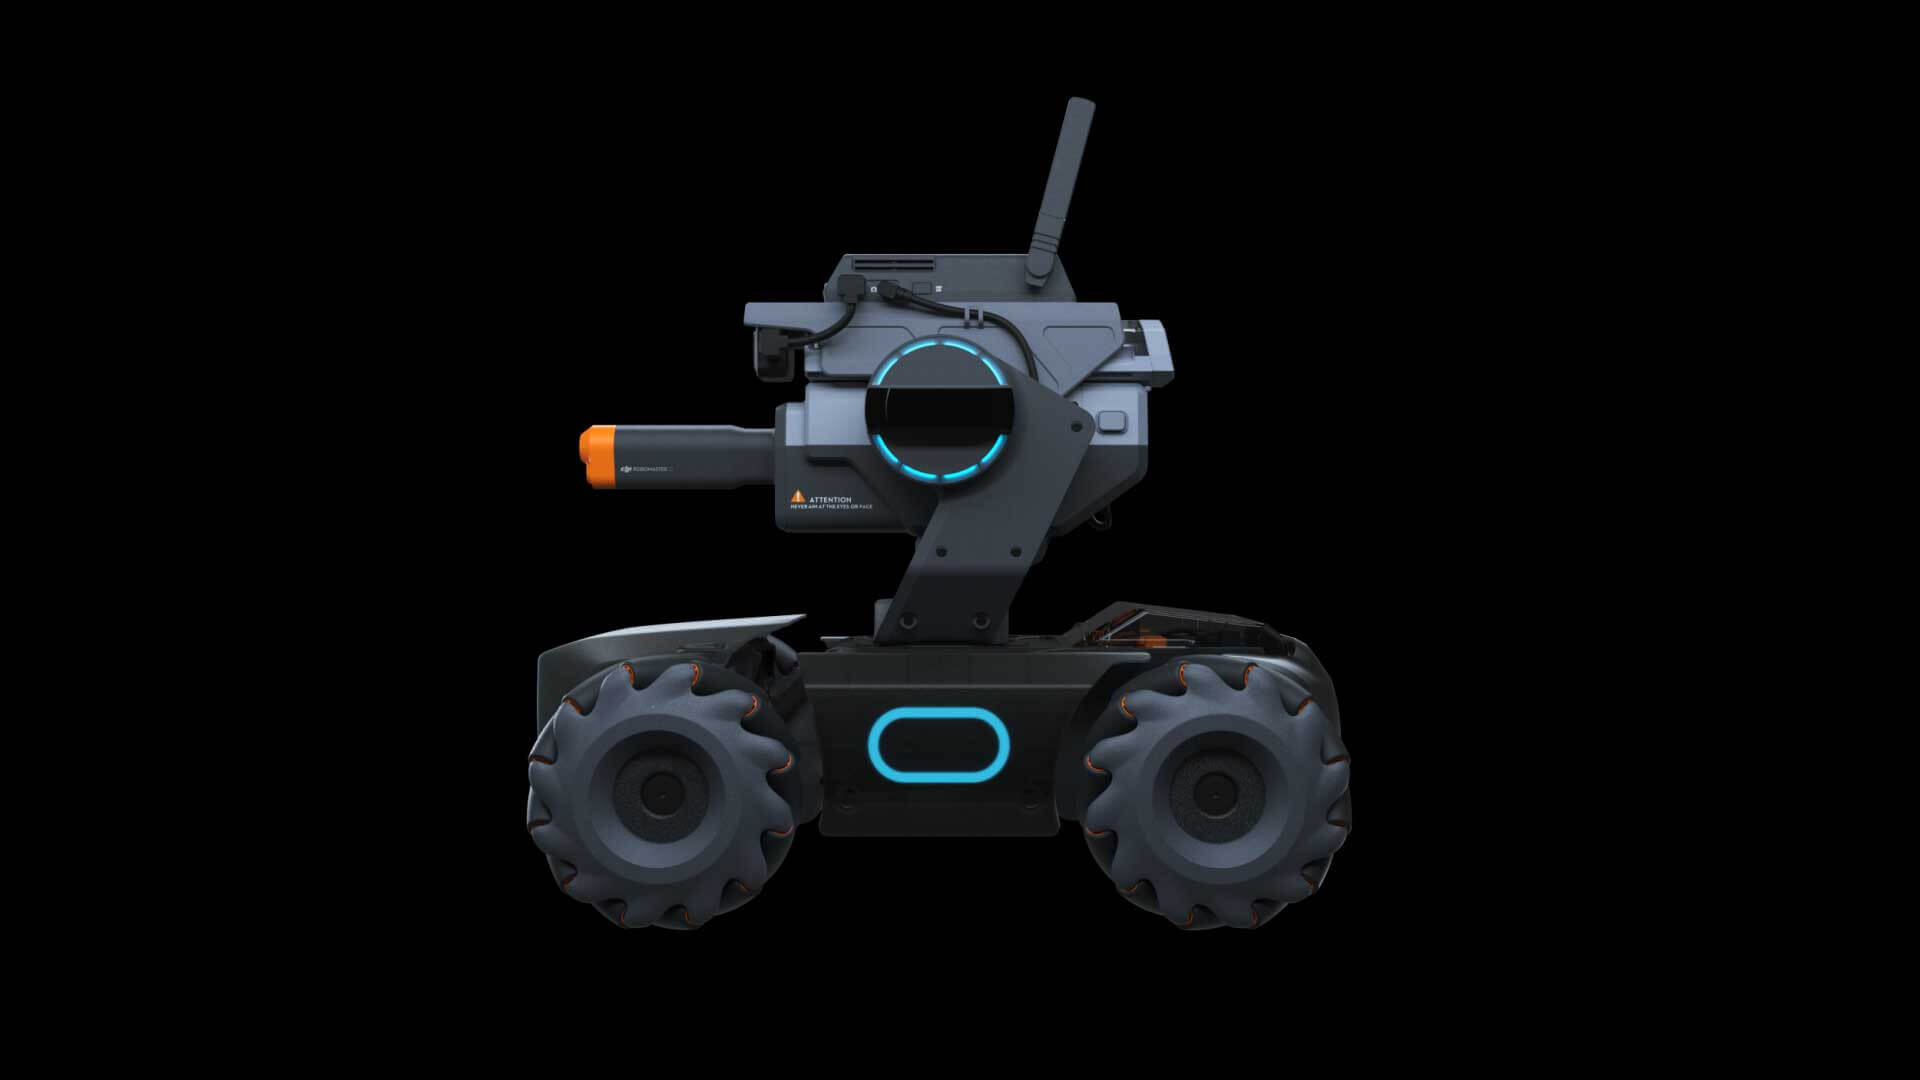 D1 Store RoboMaster Design